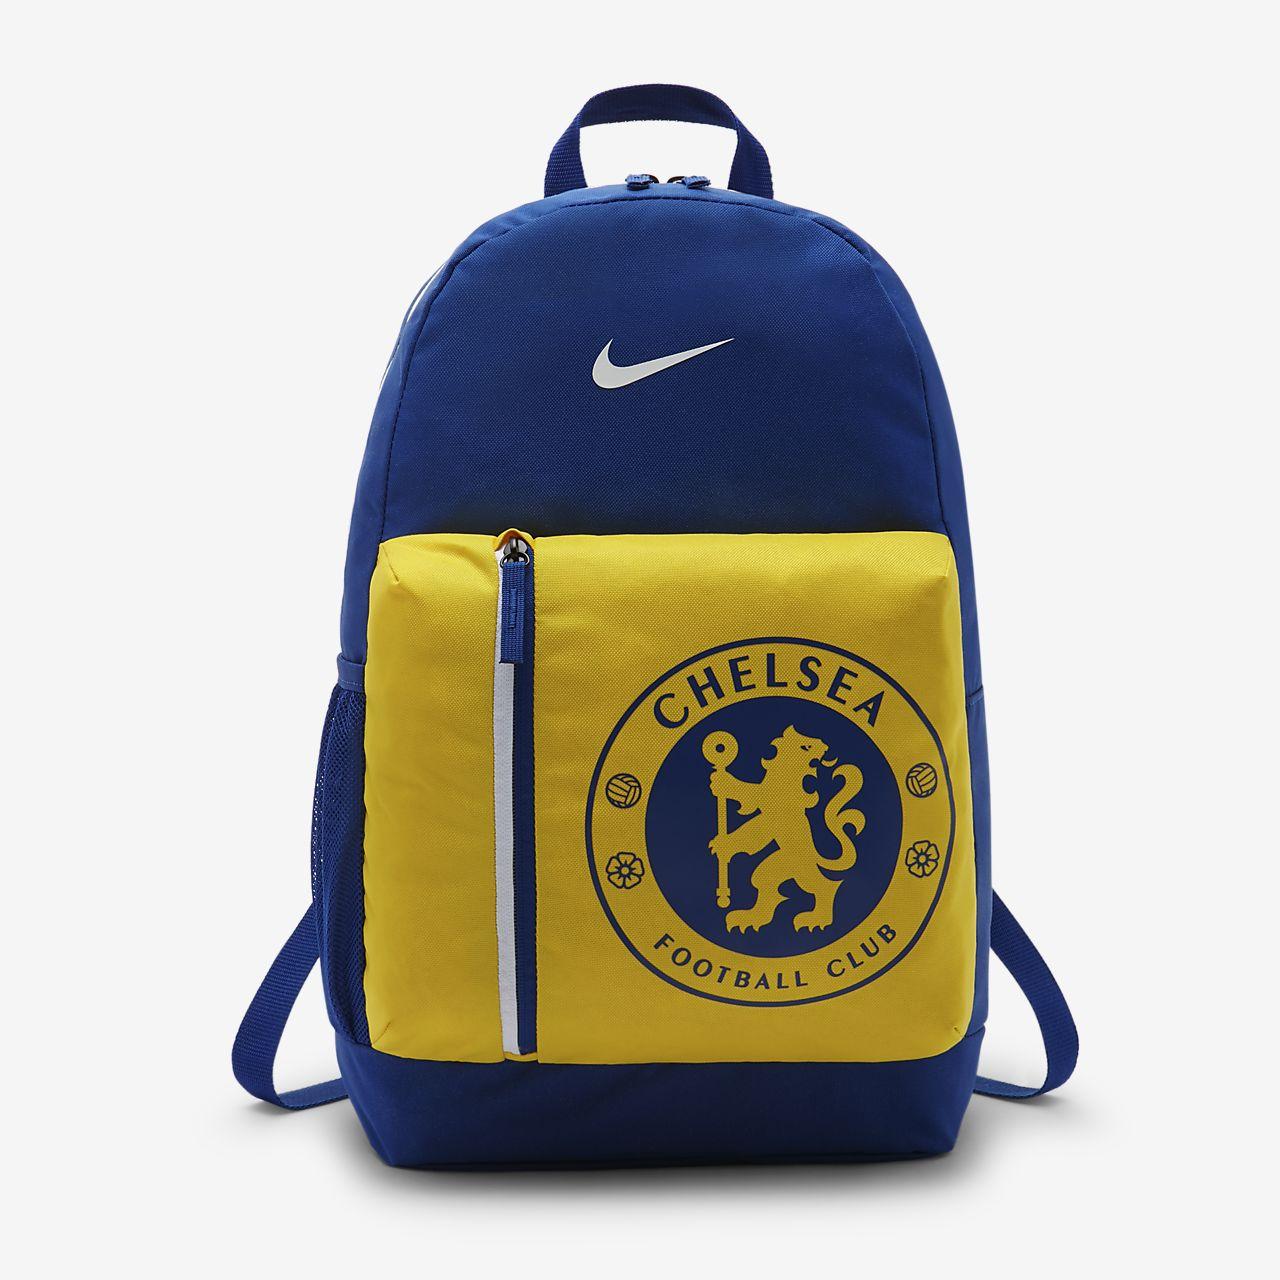 Dětský fotbalový batoh Chelsea FC Stadium pro děti. Nike.com CZ 87380e6c8ae